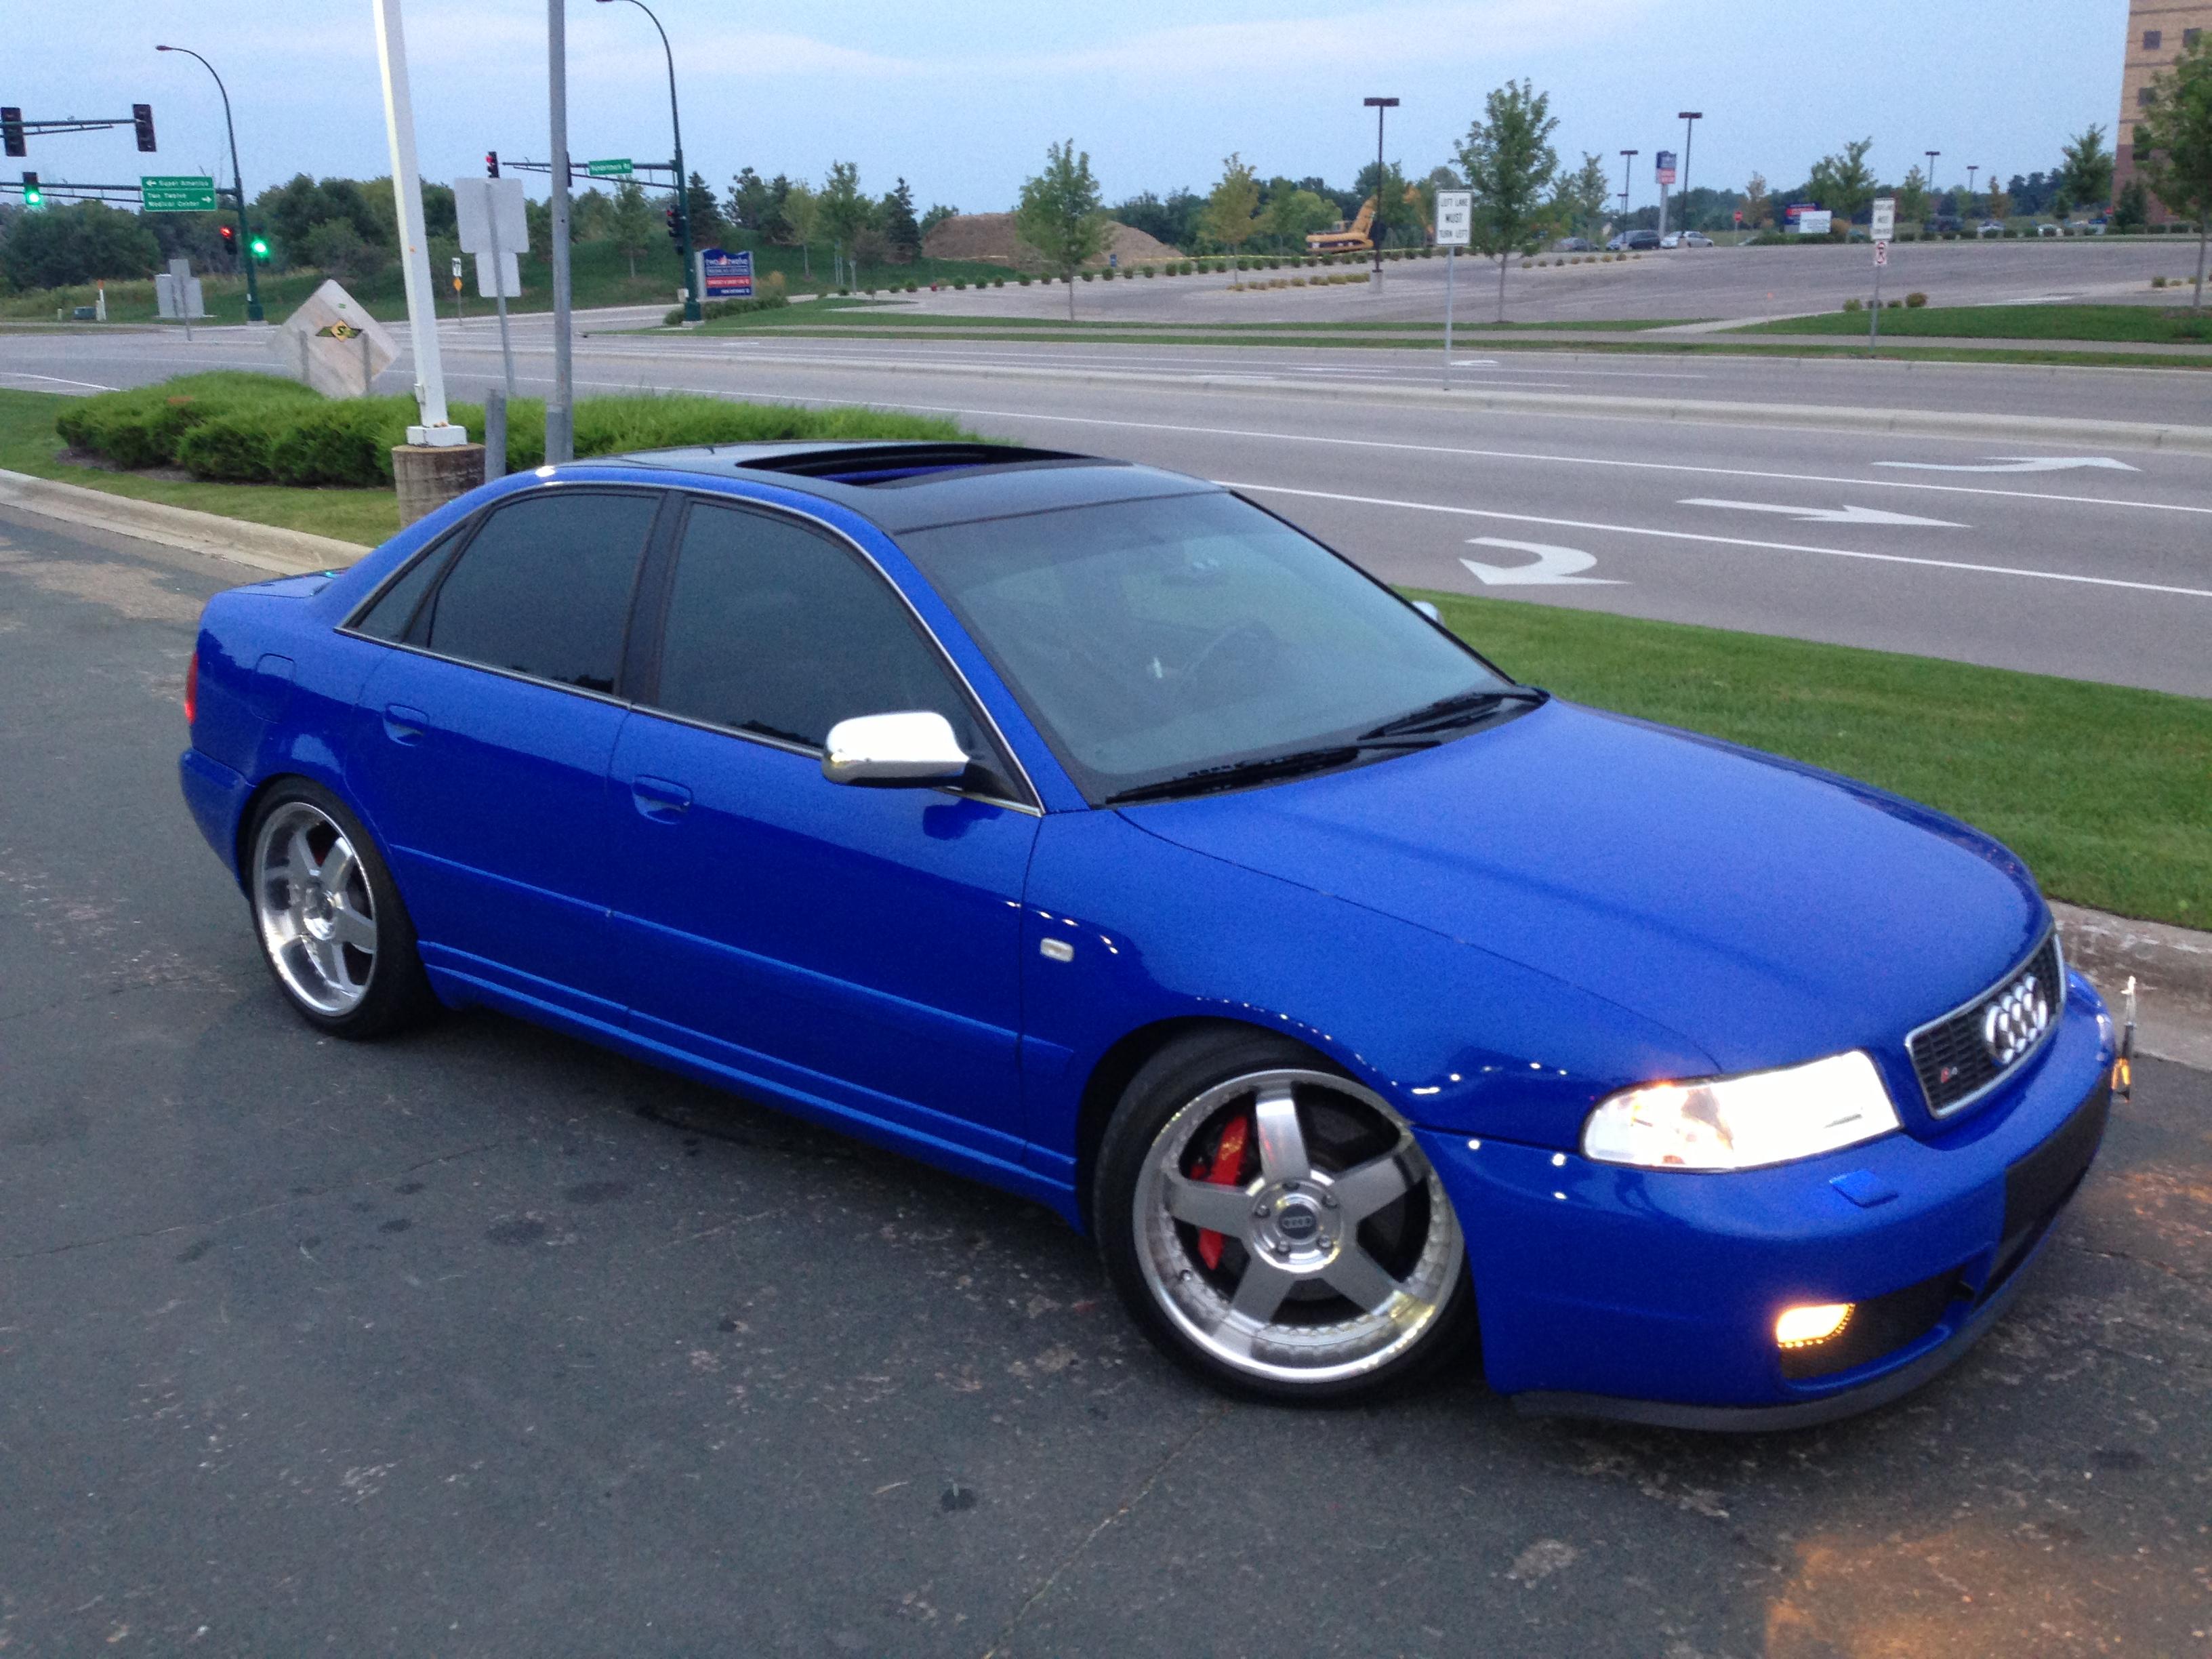 2001 Audi S4 Image 8